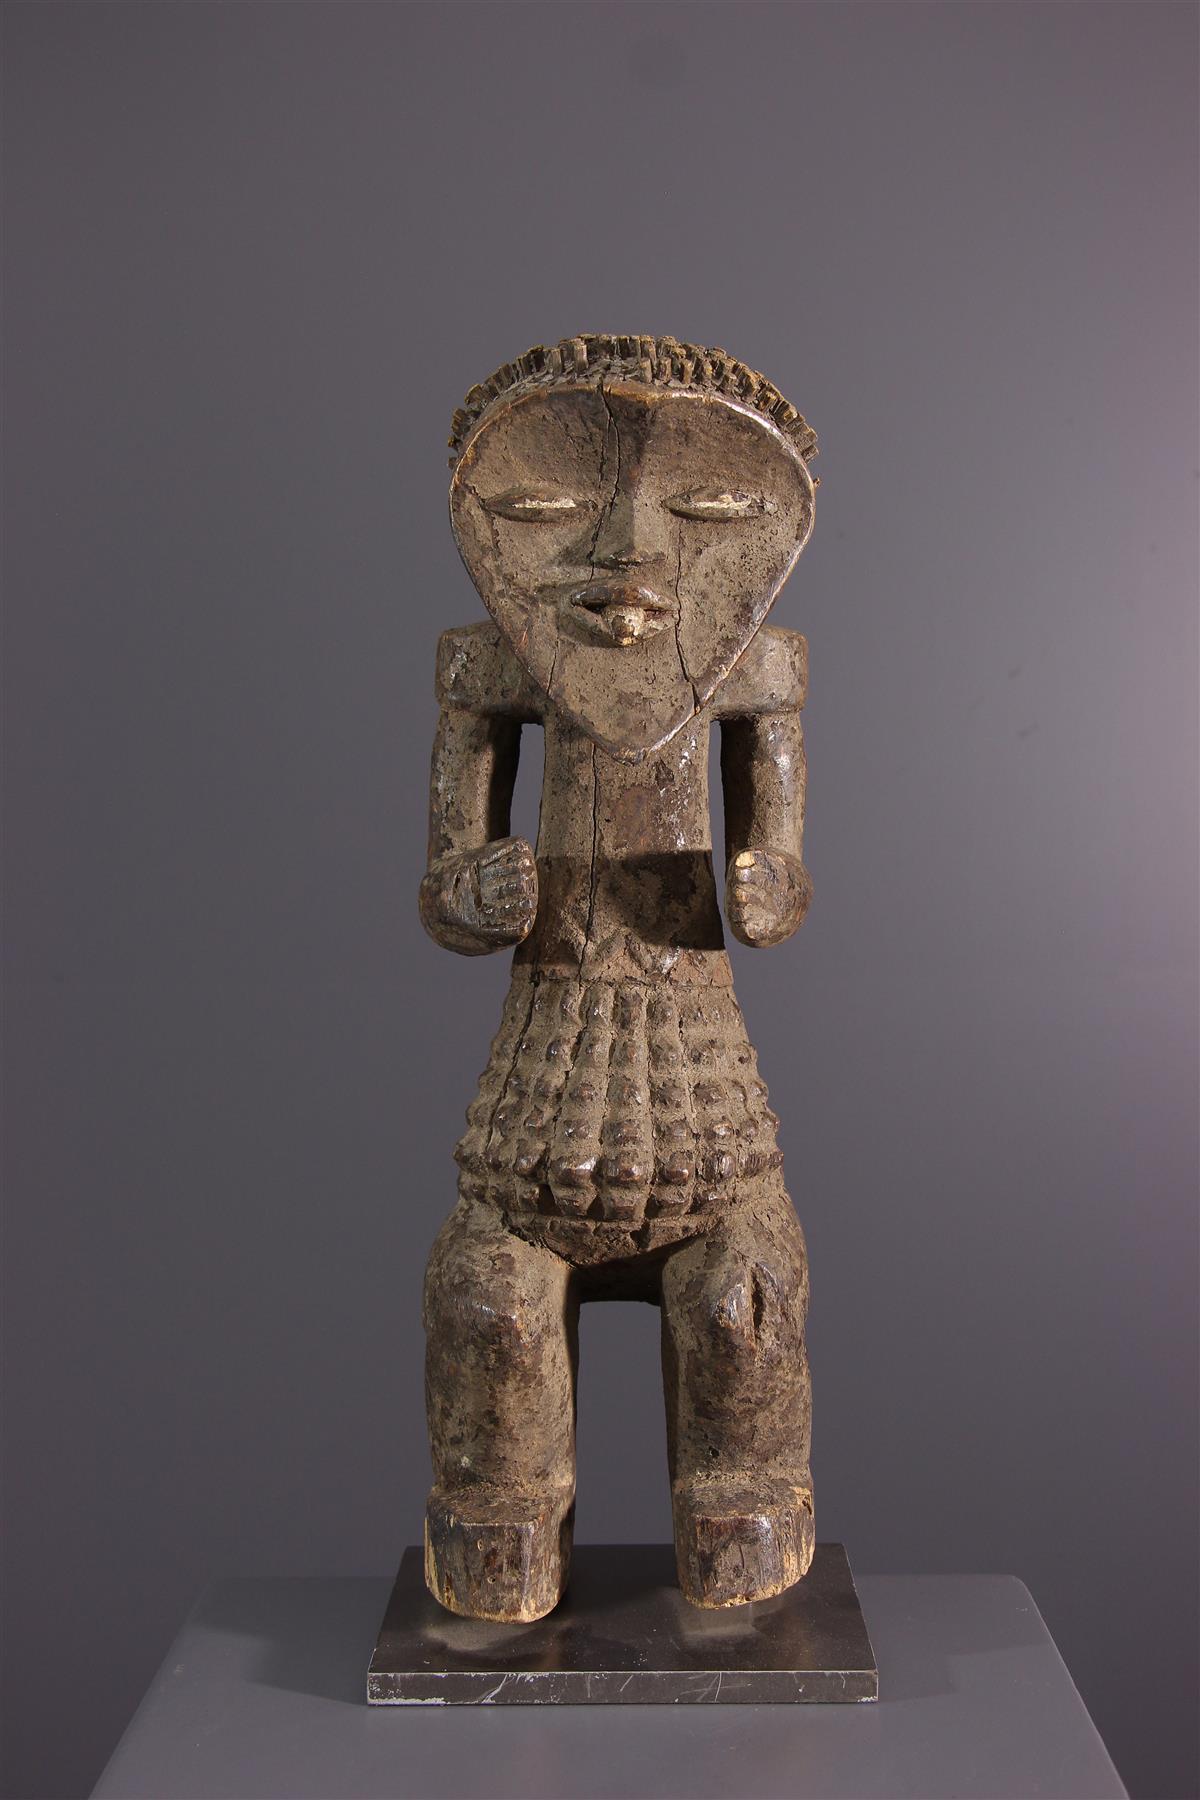 Mambila - Tribal art